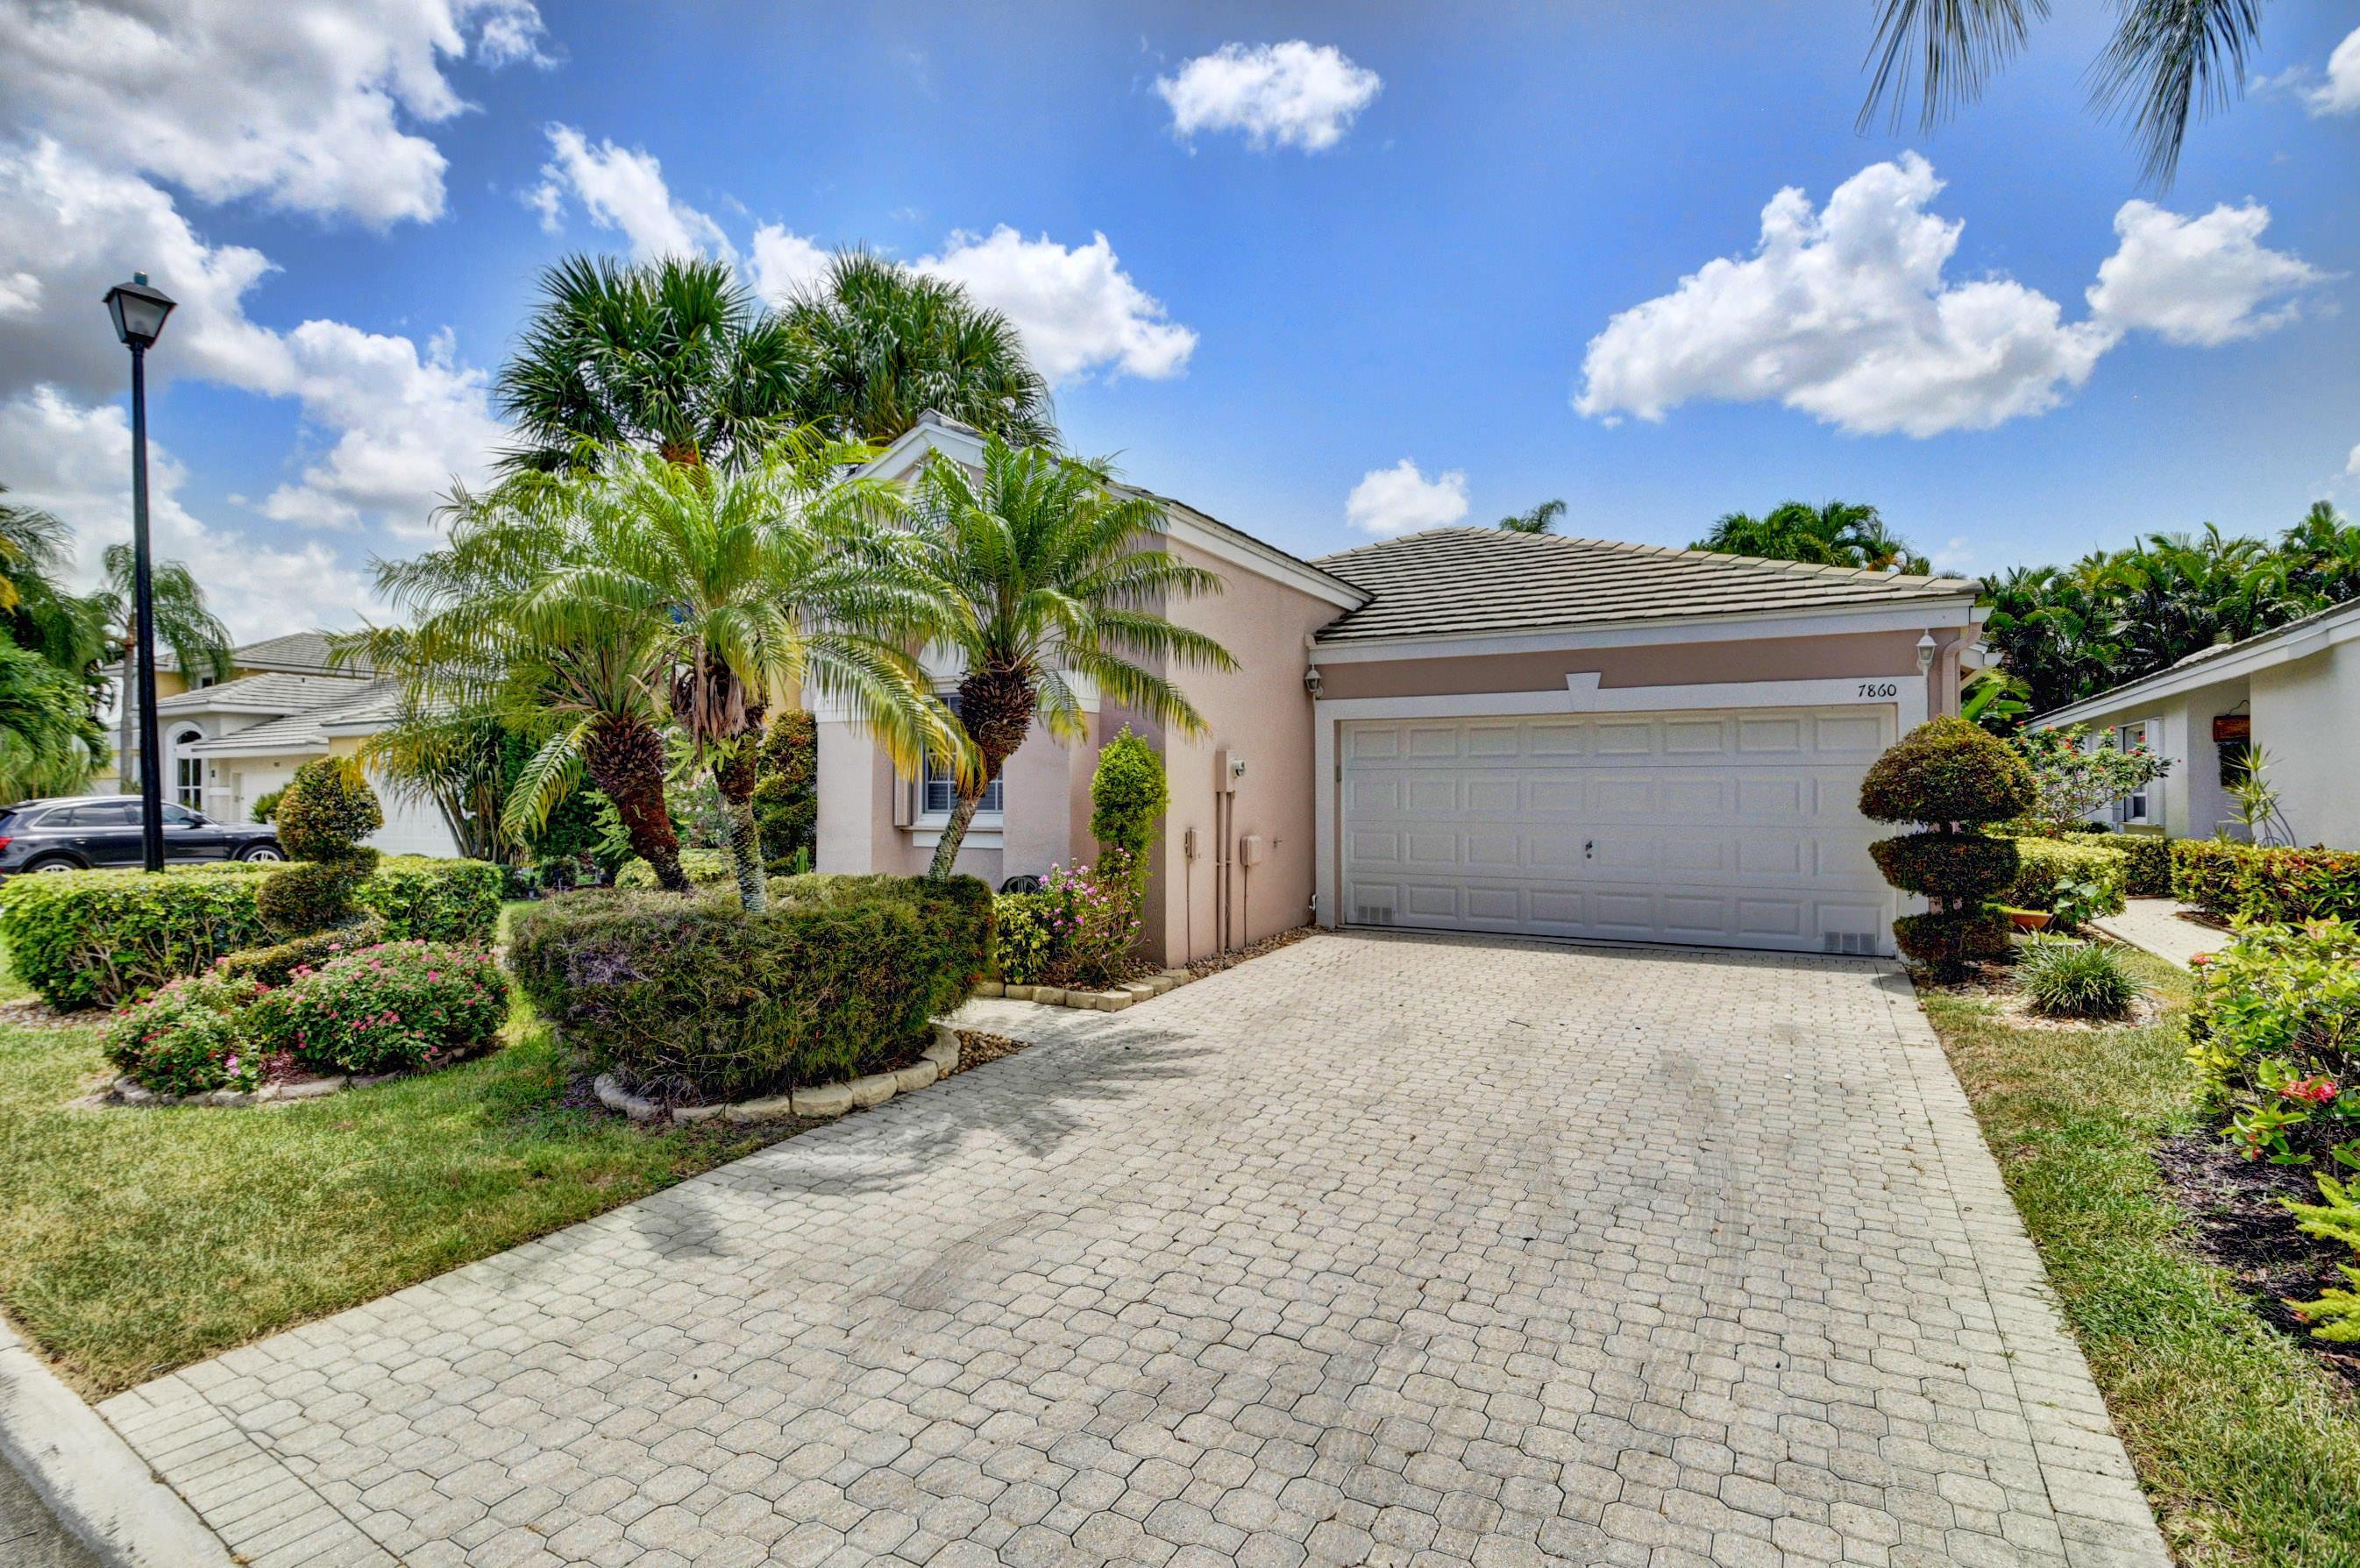 7860 Travelers Tree Drive Boca Raton, FL 33433